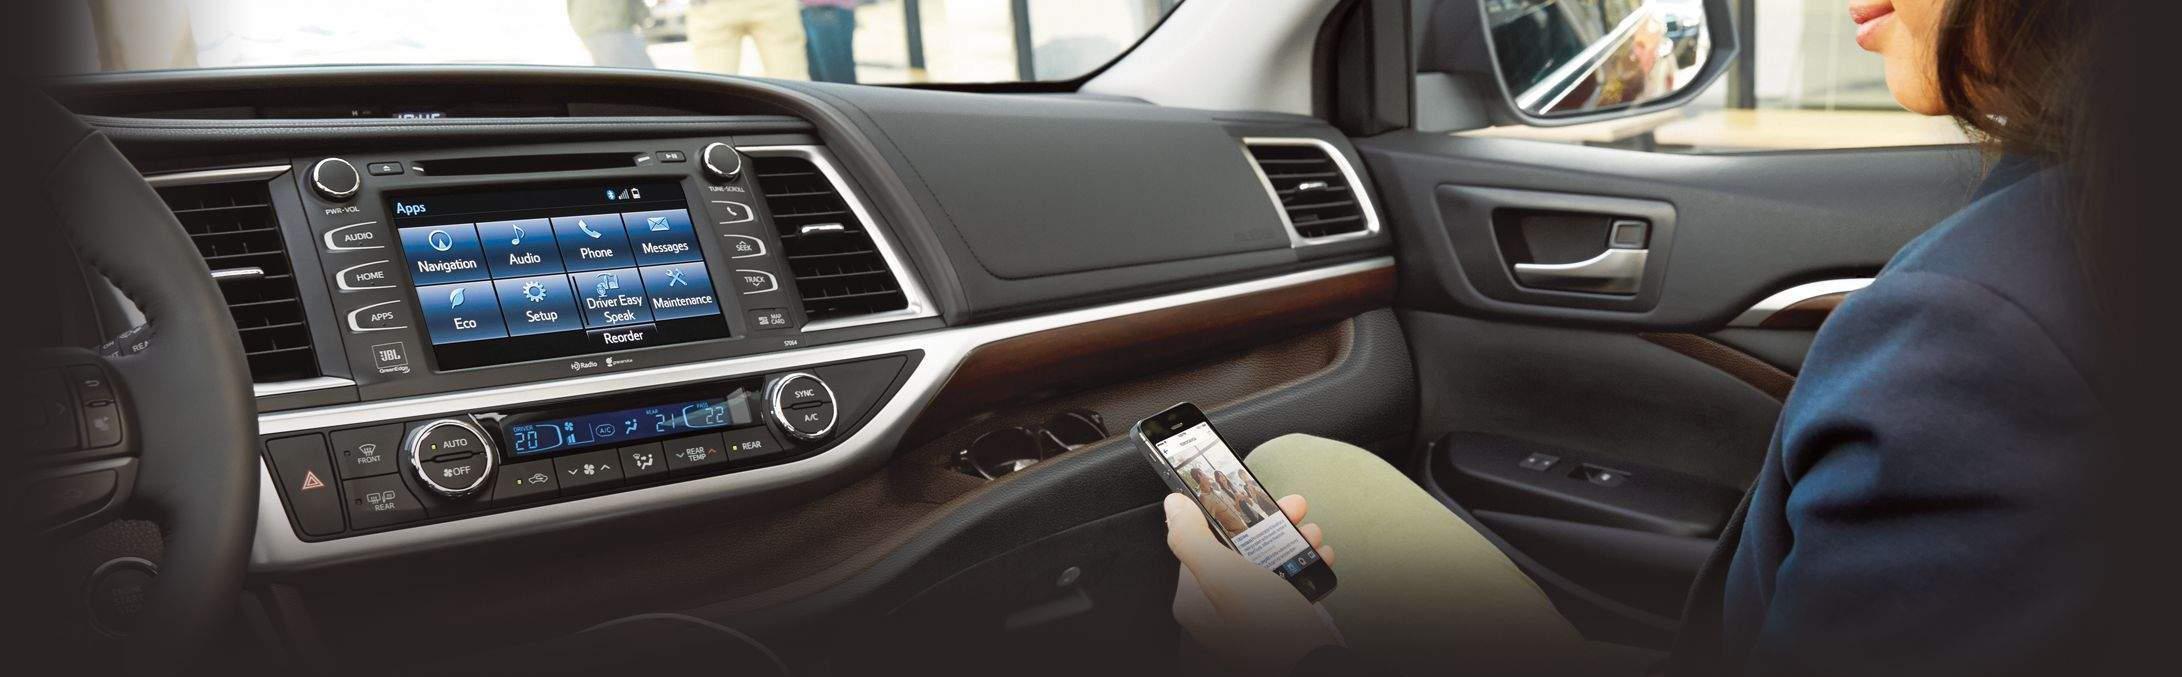 toyota-convenience-technology-2016-highlander-display-audio-l-narrow